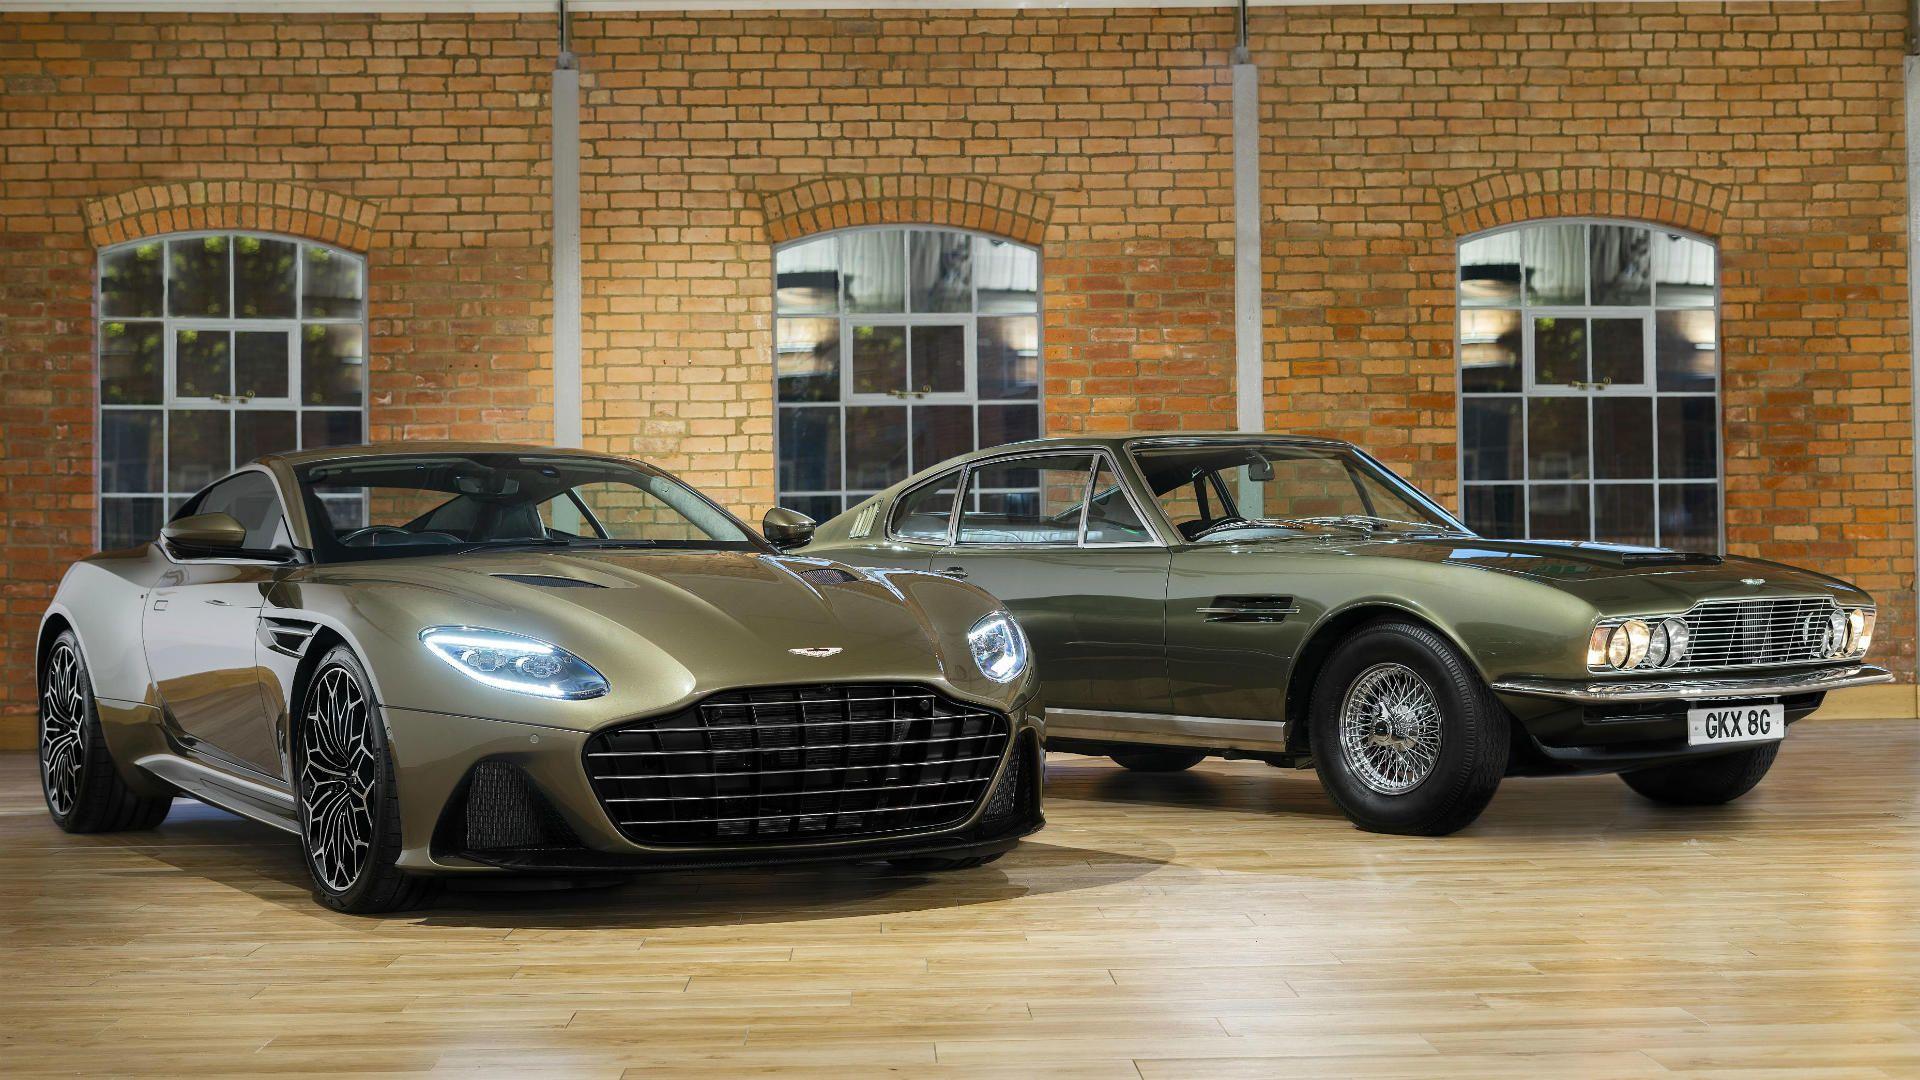 Parabrisas Aston Martin Dbs Superleggera Ohmss El Tributo A Un Film De 007